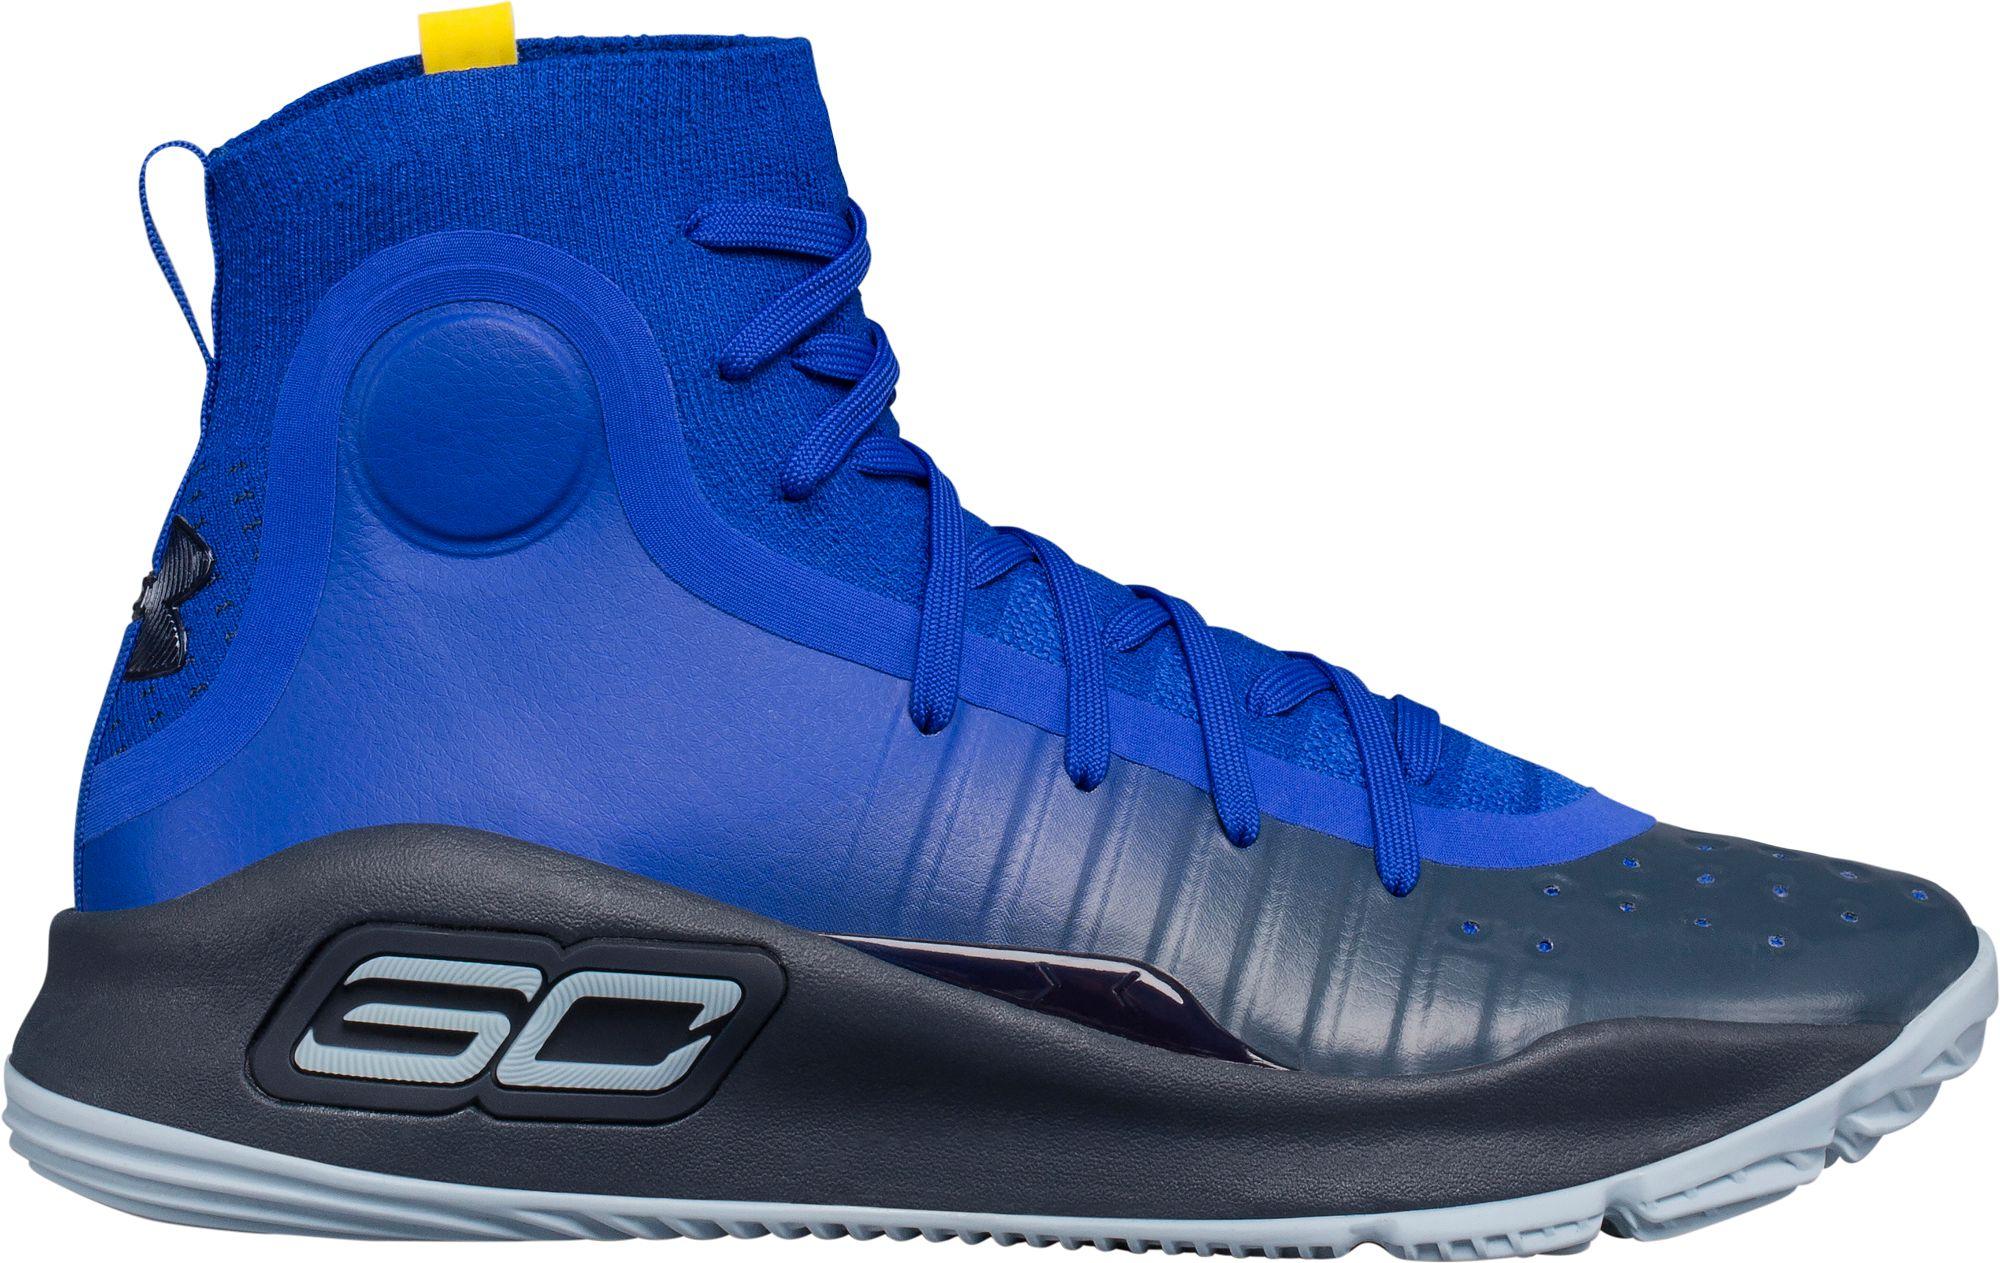 663847846ec Under Armour Kids  Grade School Curry 4 Basketball Shoes